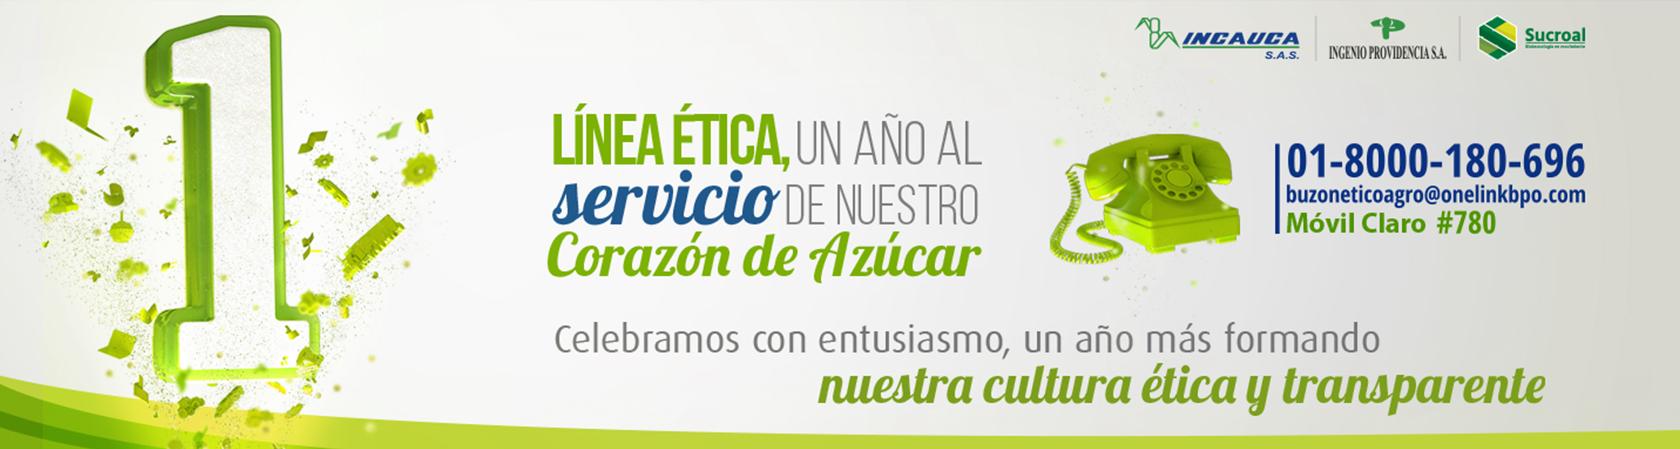 linea-etica_ingenio-providencia